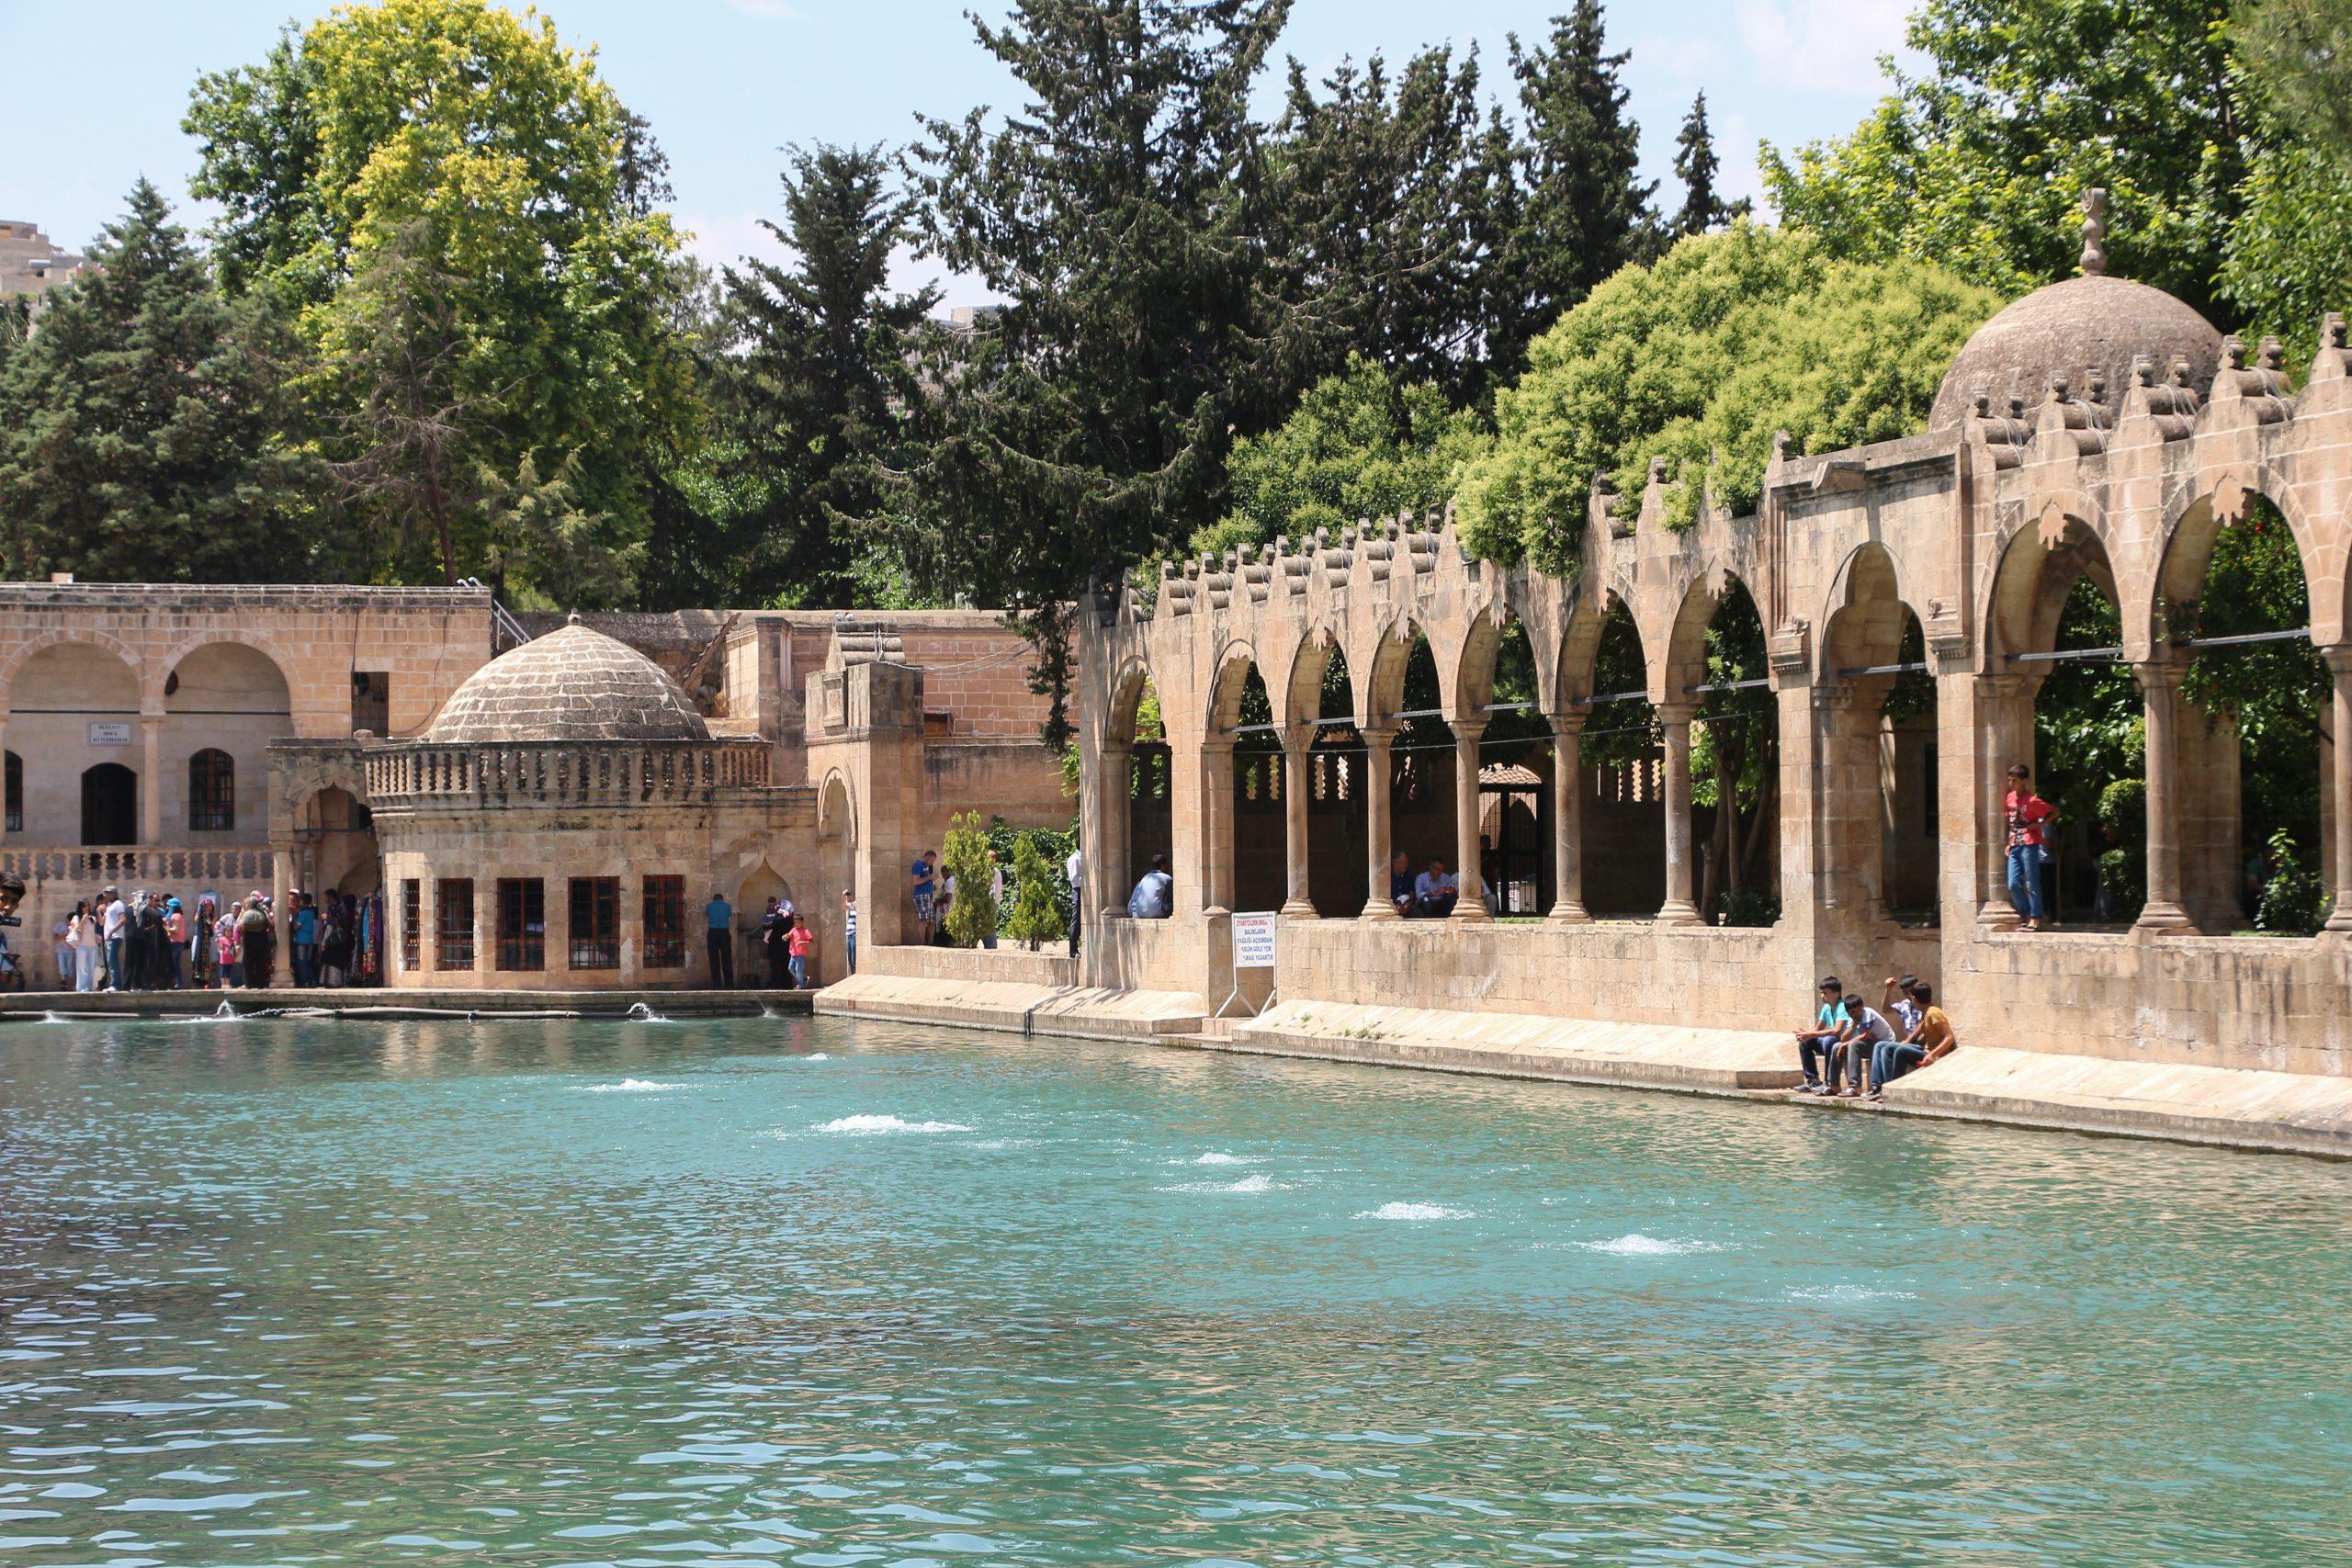 Balikli Göl (Abraham's Pool) at the site of ancient Edessa, now Urfa, Turkey